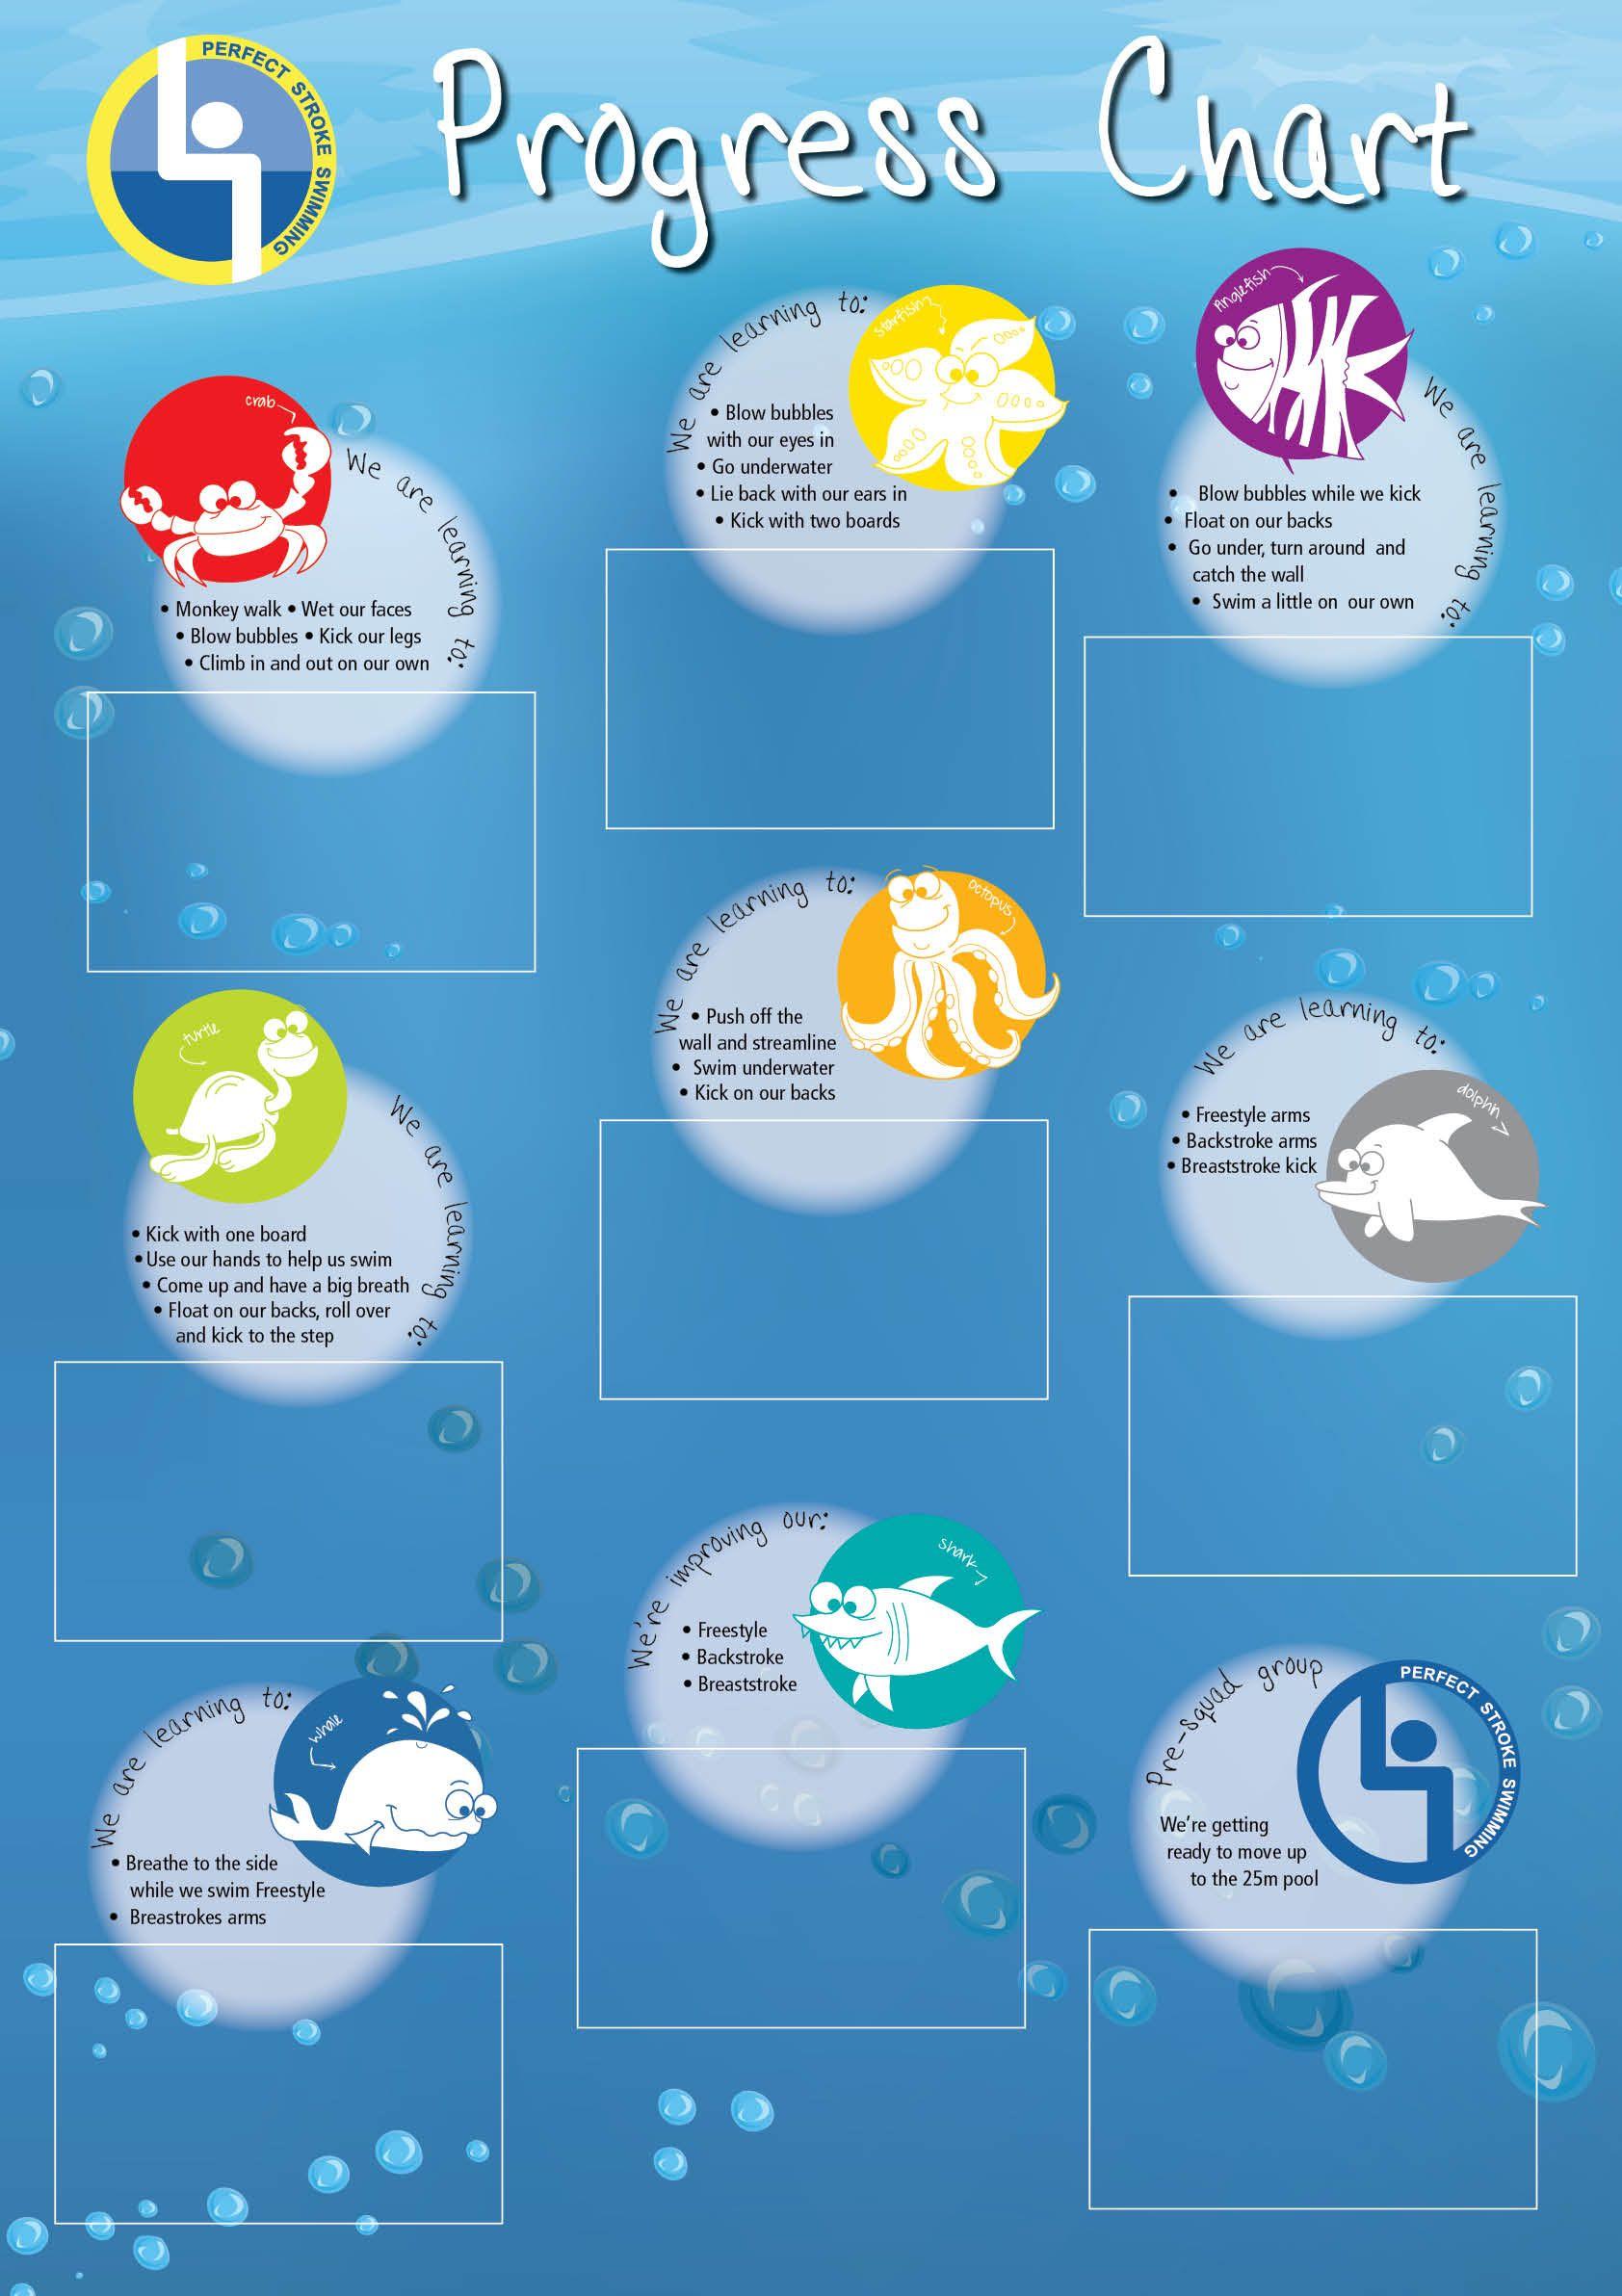 Perfect Strokes Swim School Progress Chart Design